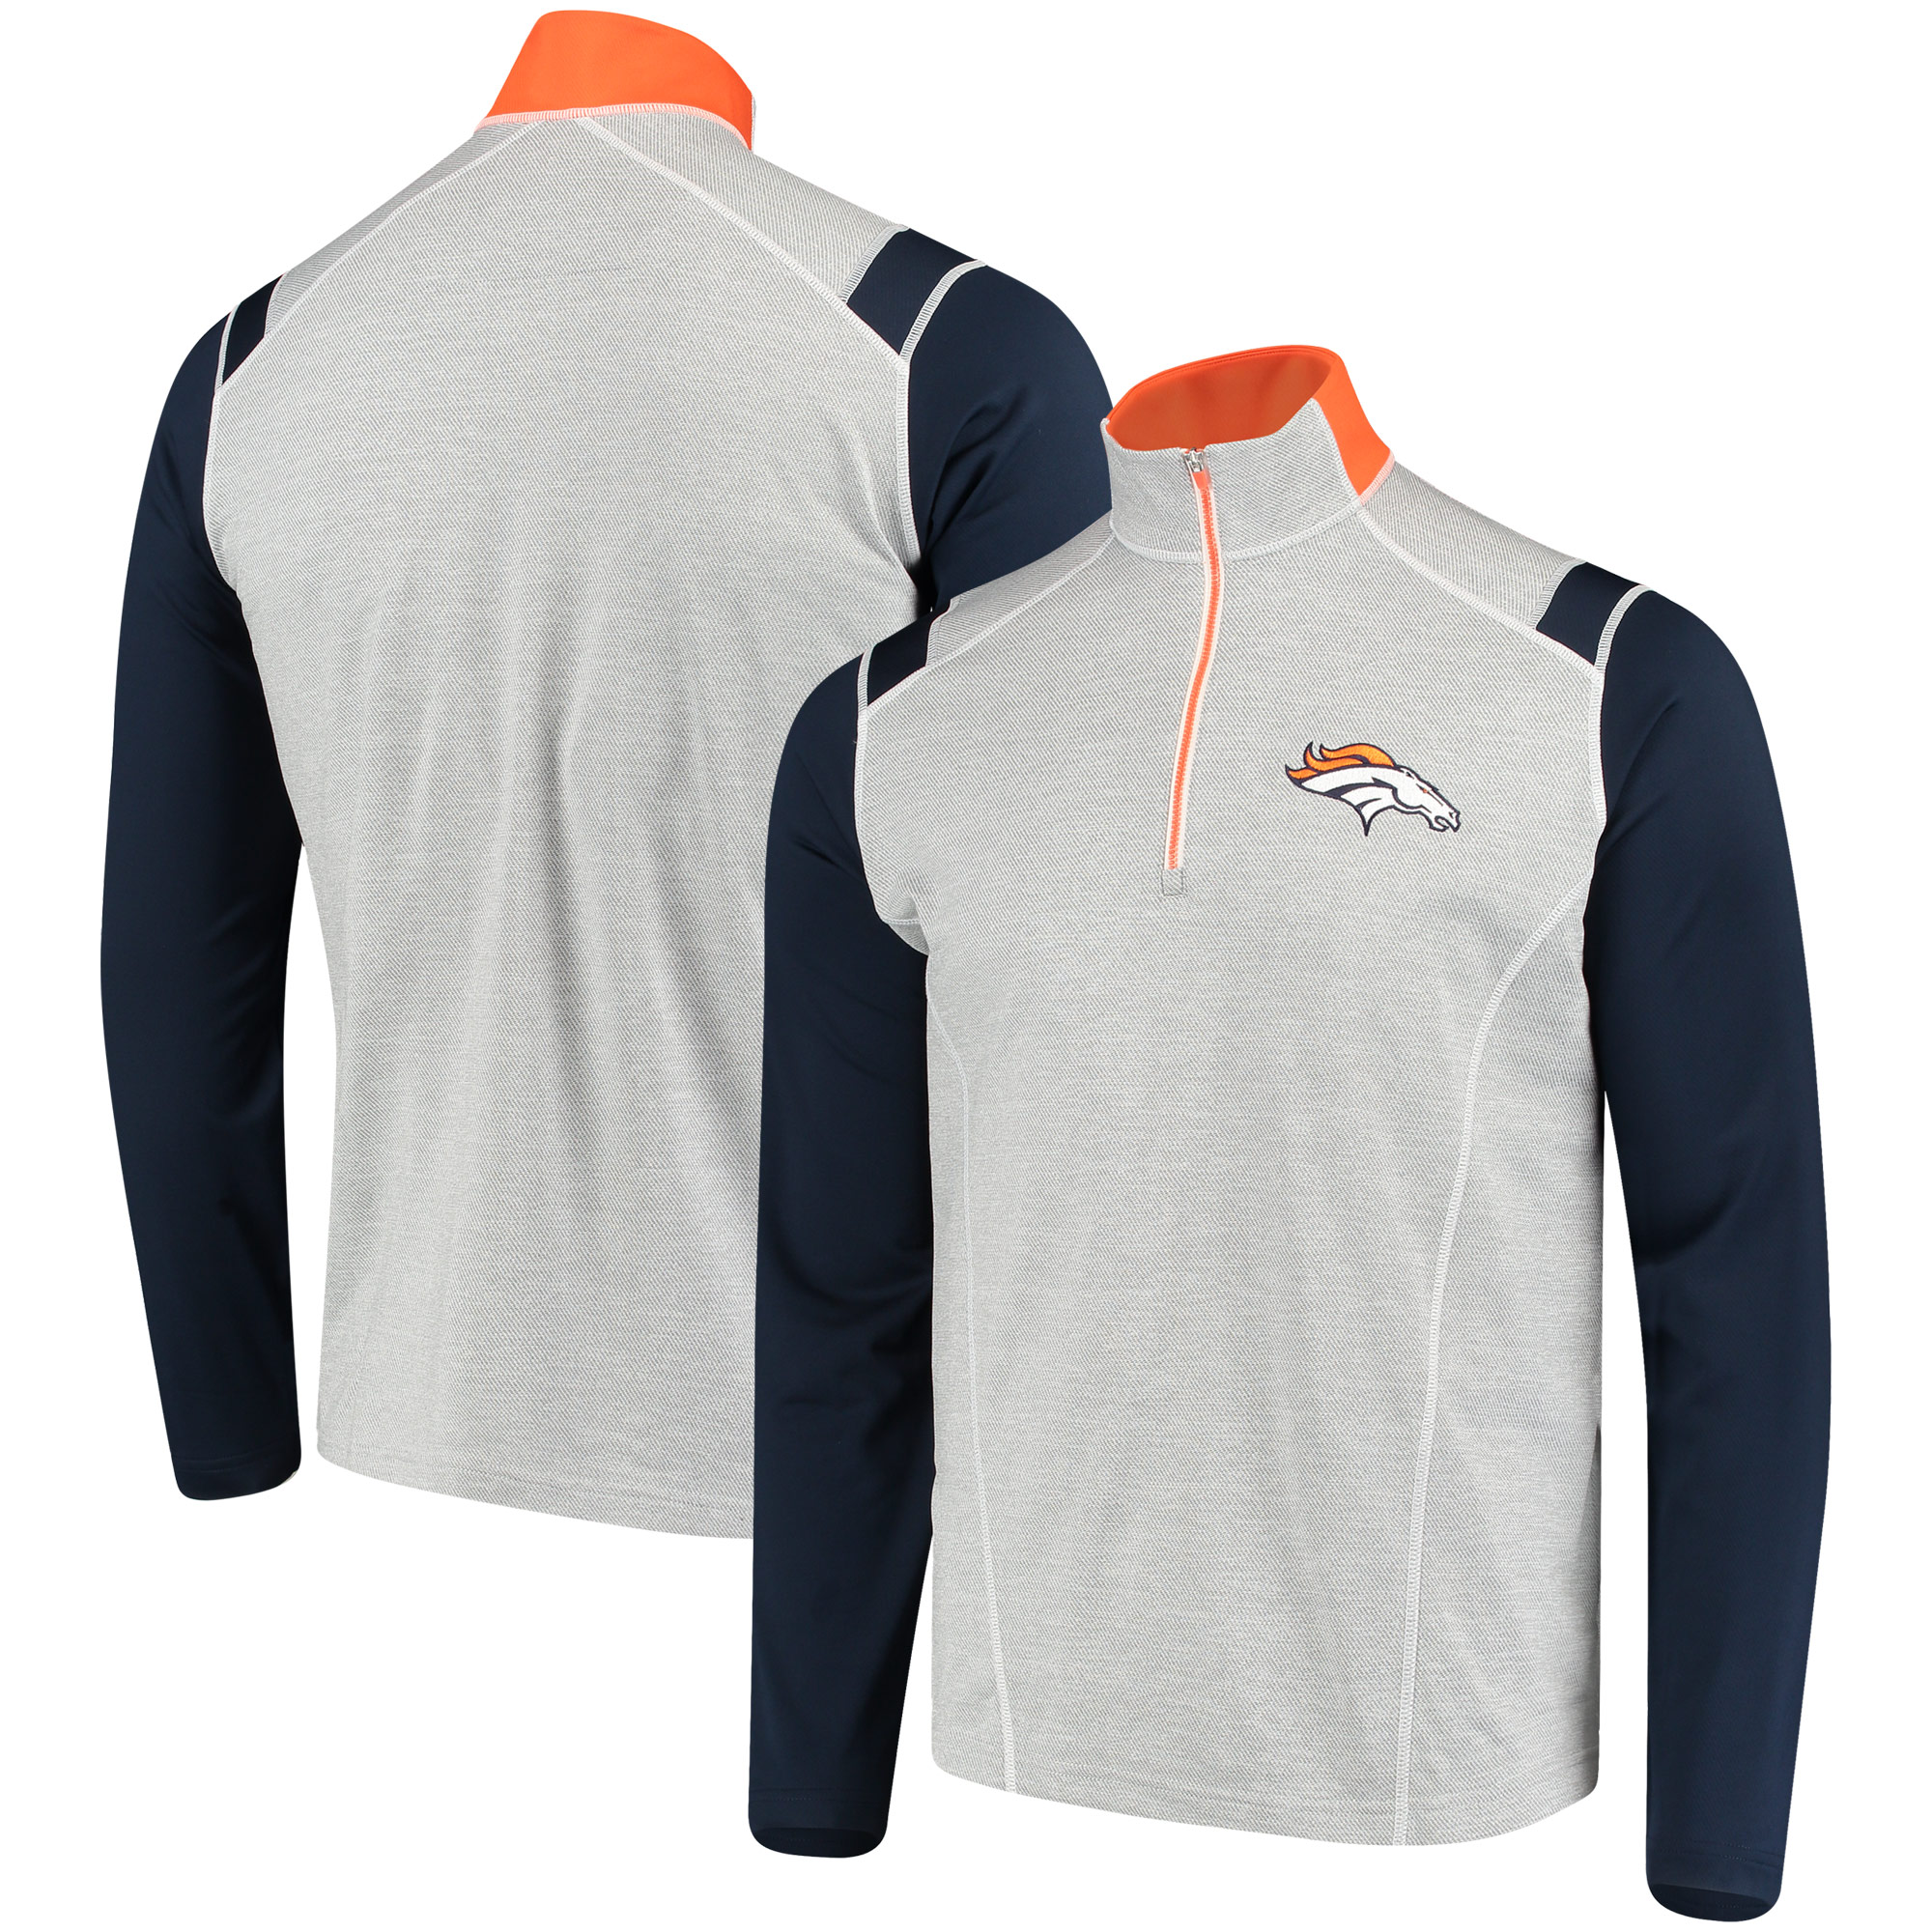 Denver Broncos Antigua Automatic Quarter-Zip Jacket - Navy/Heathered Gray